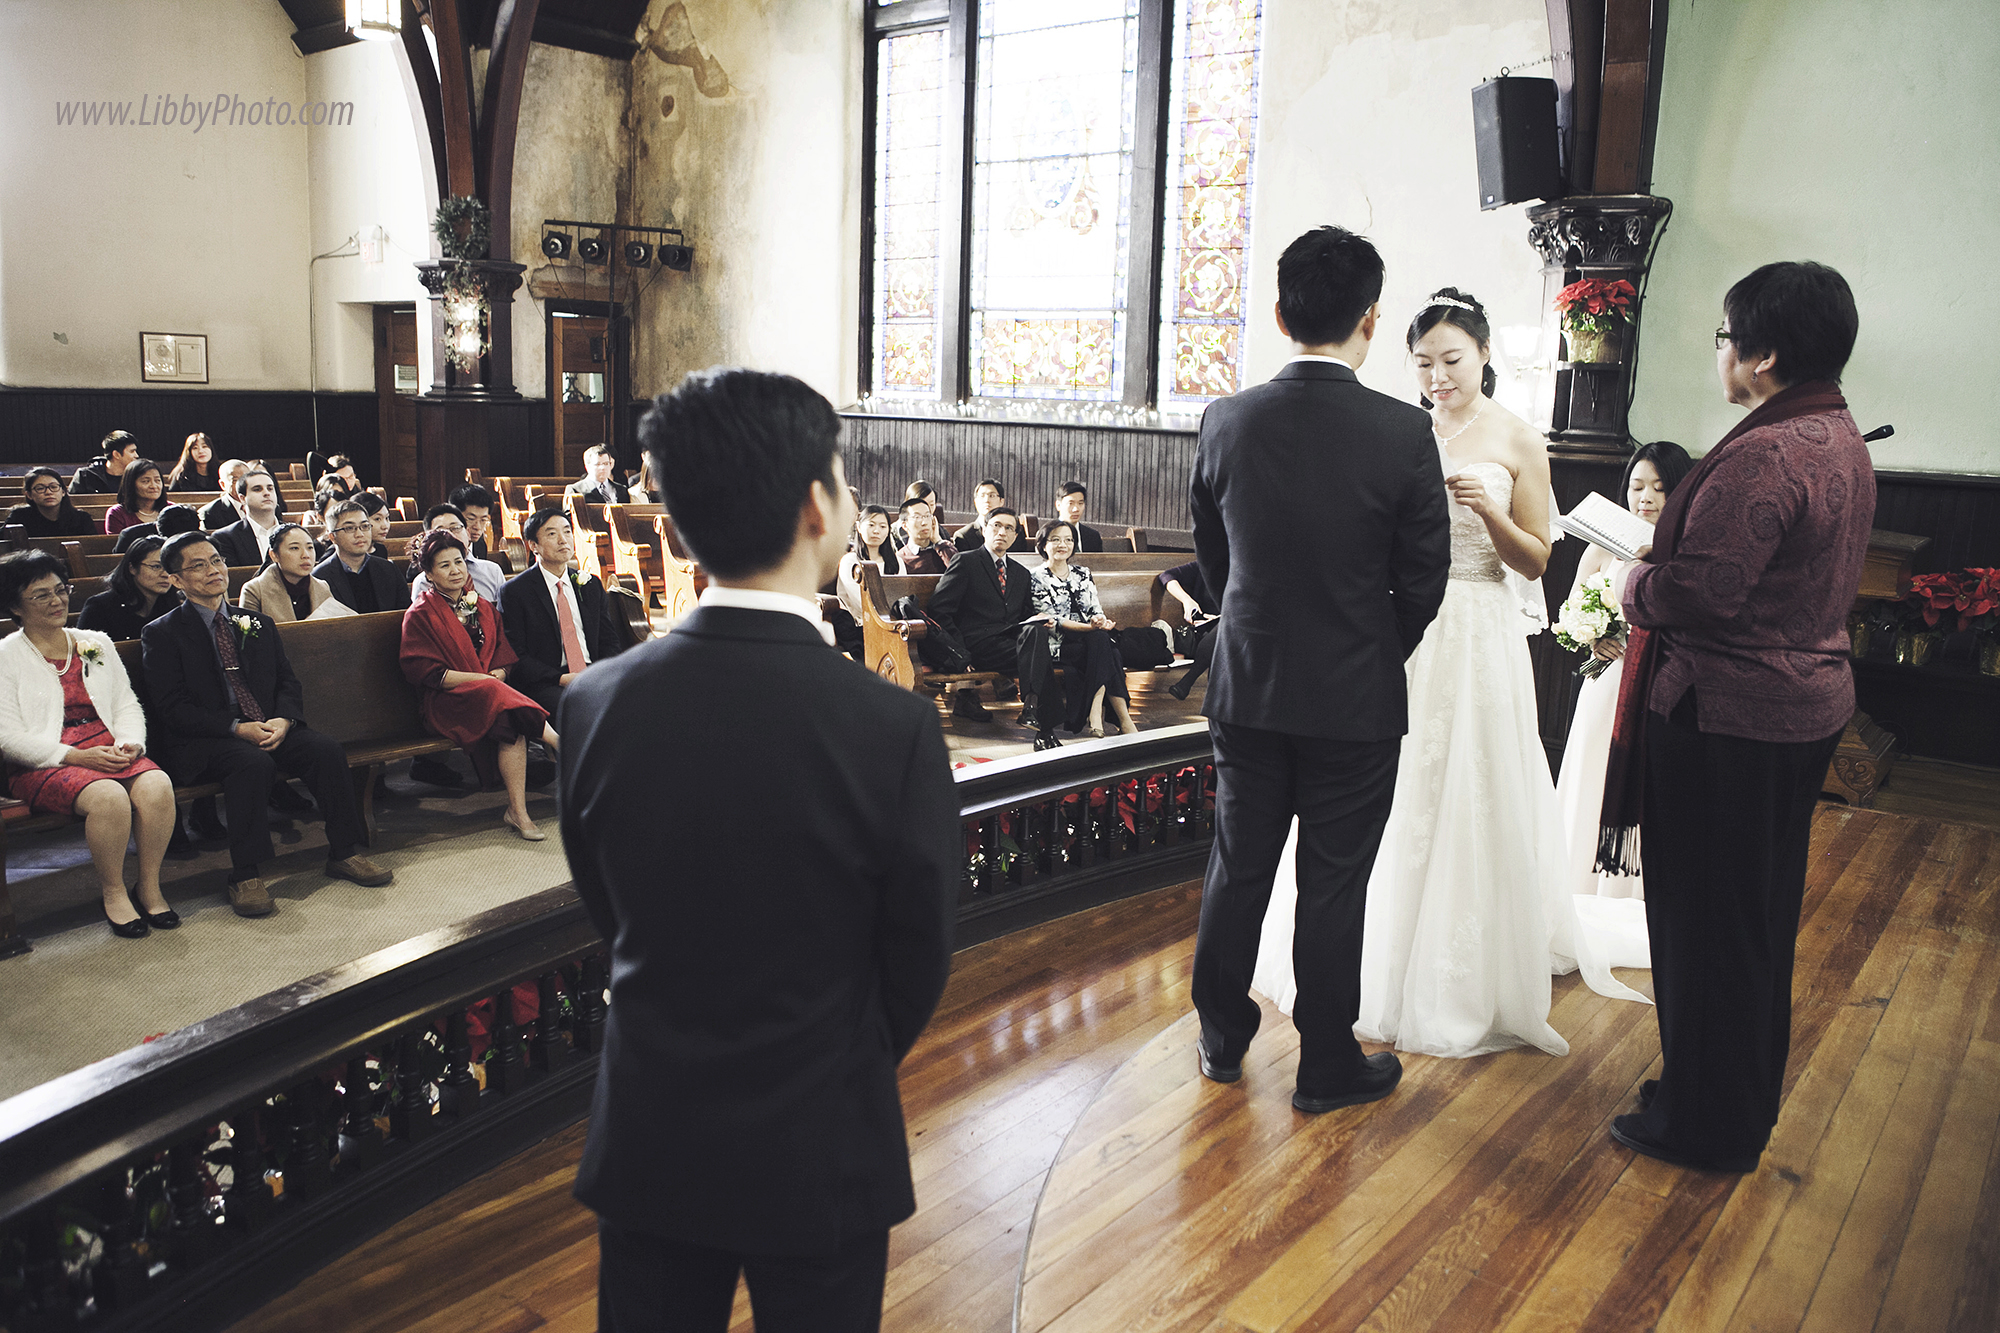 Atlanta wedding photography Libbyphoto (37).jpg